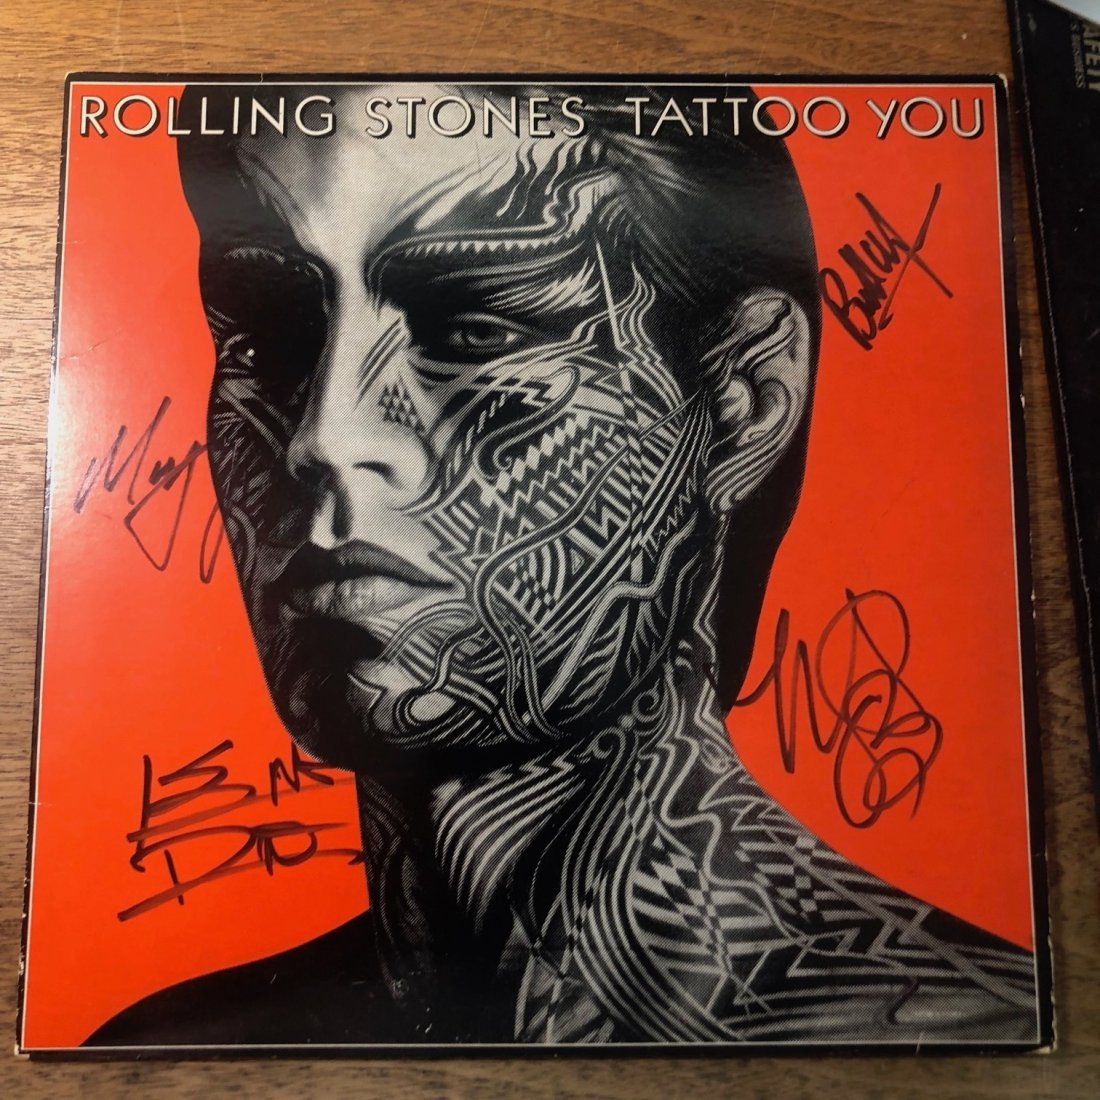 Signed Rolling Stones Tattoo You Album